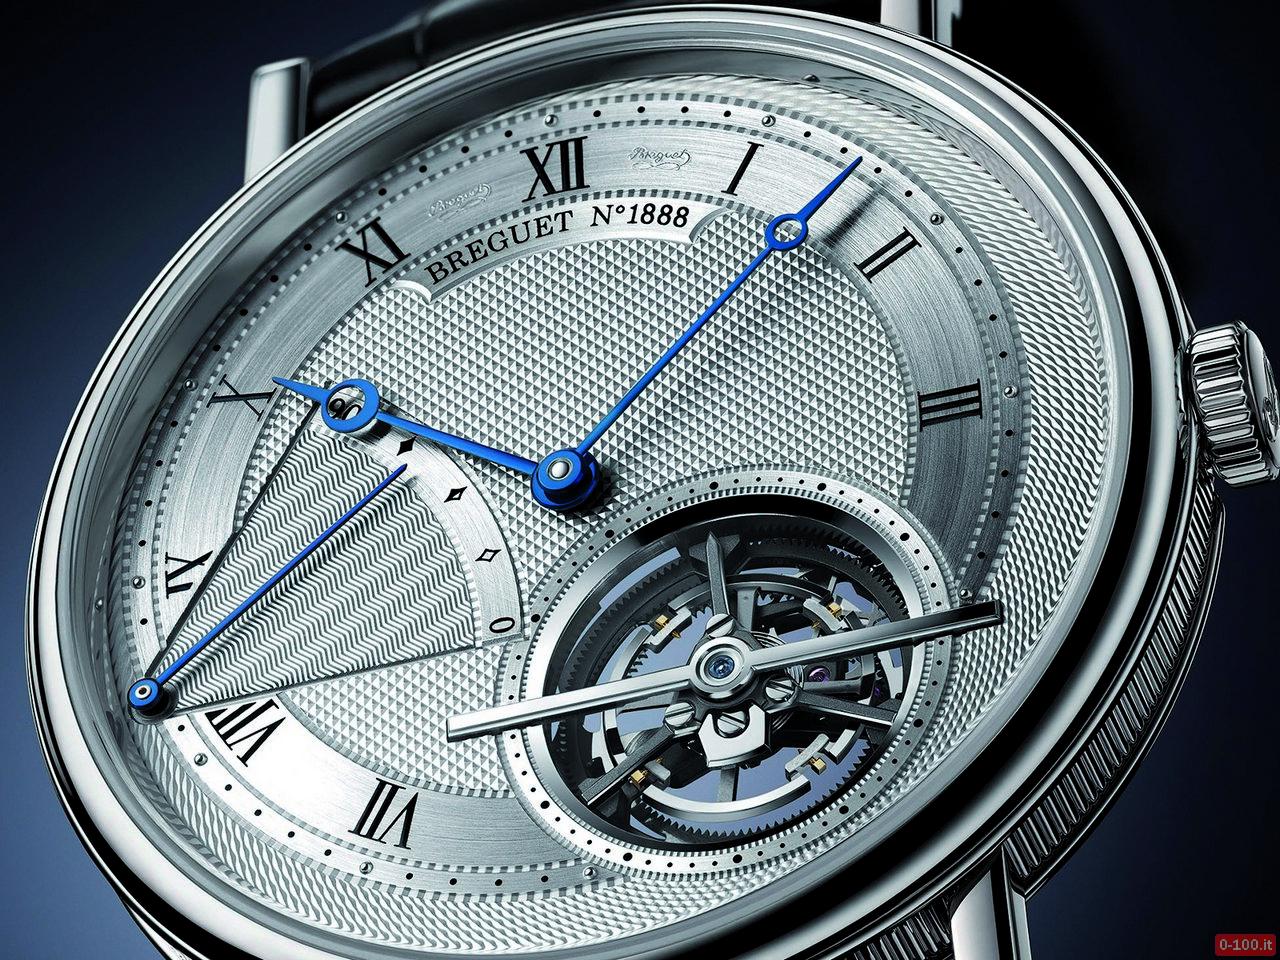 anteprima-baselworld-2014-breguet-classique-grande-complication-tourbillon-extra-plat-automatique-5377-0-100_4